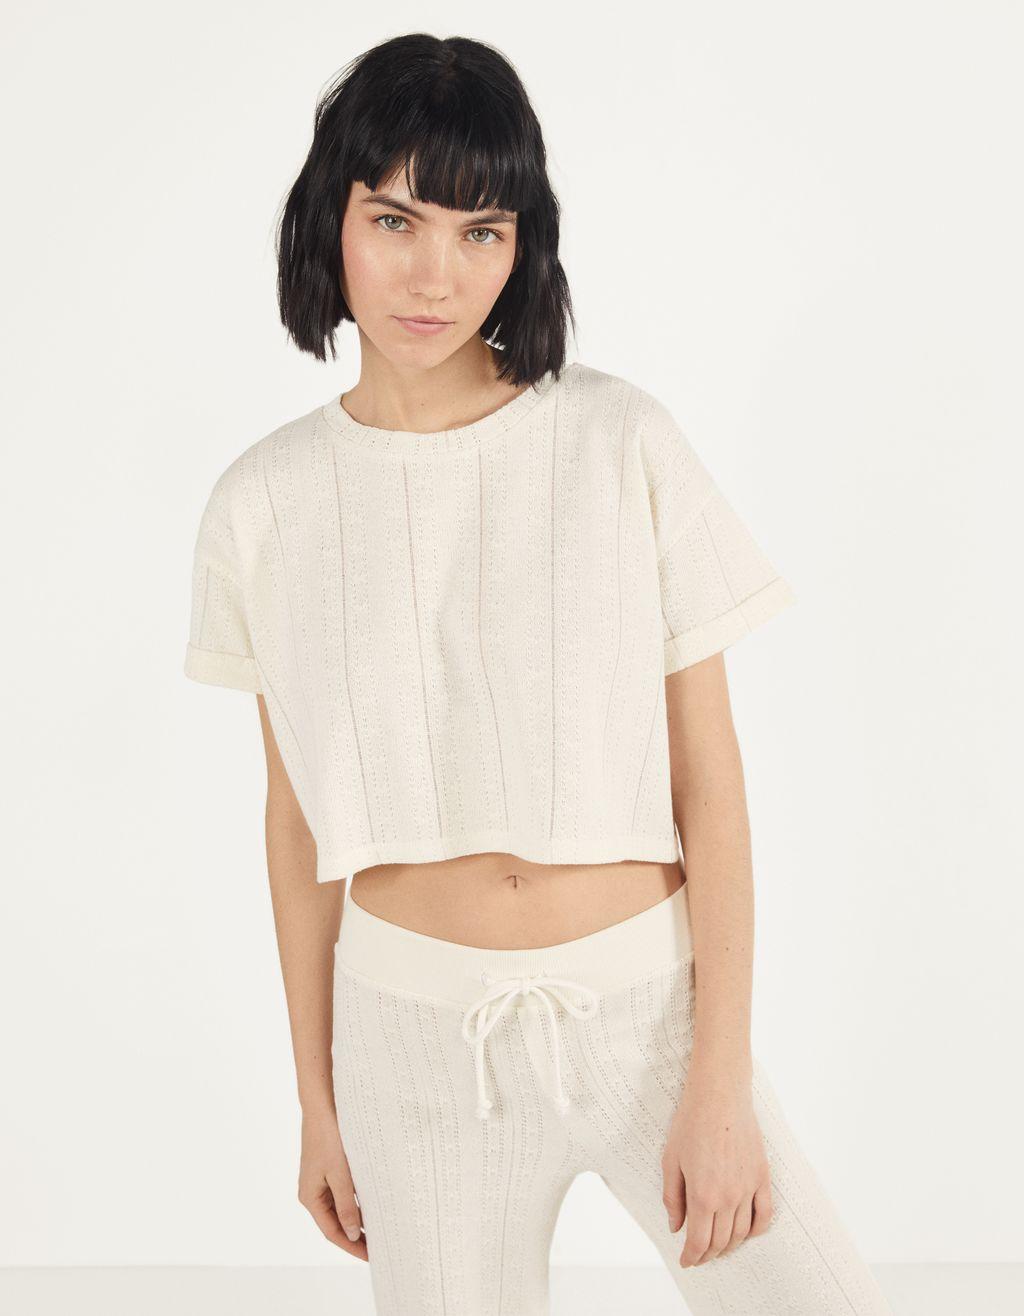 T-shirt med korte, oprullede ærmer